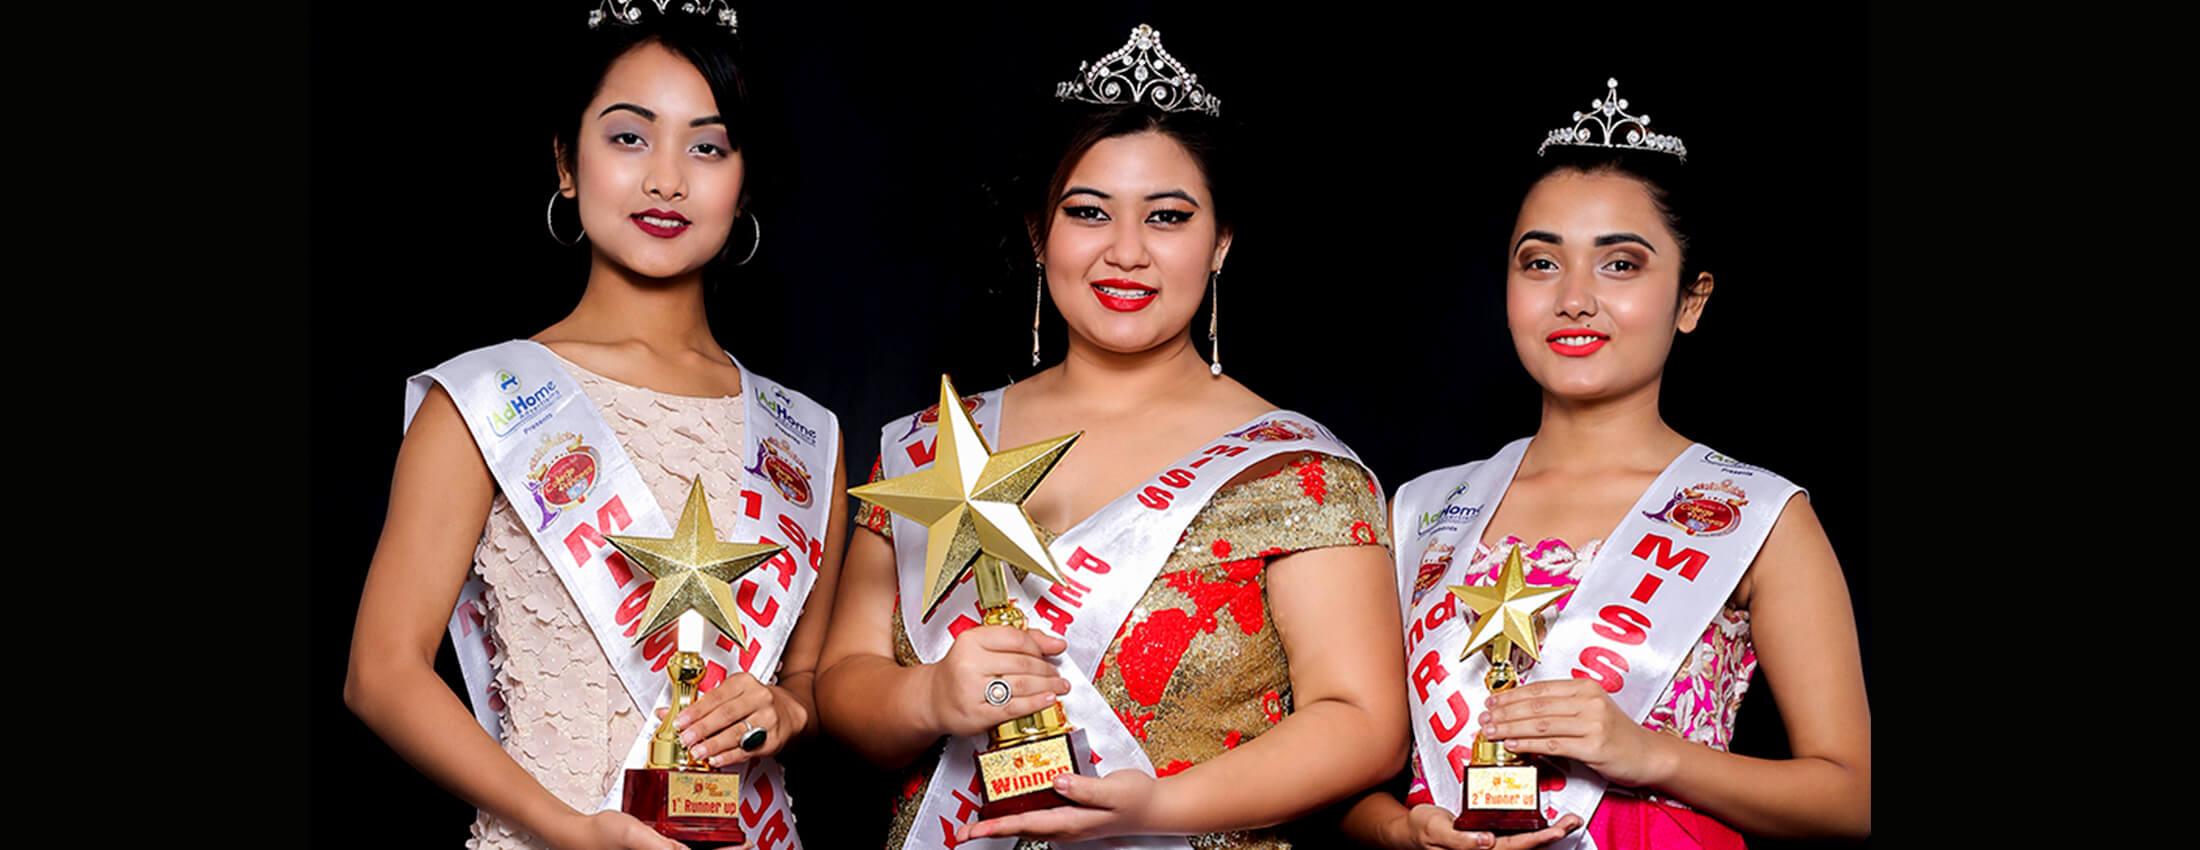 Purwanchal College Princess 2017 winners - Imgstock, Biratnagar